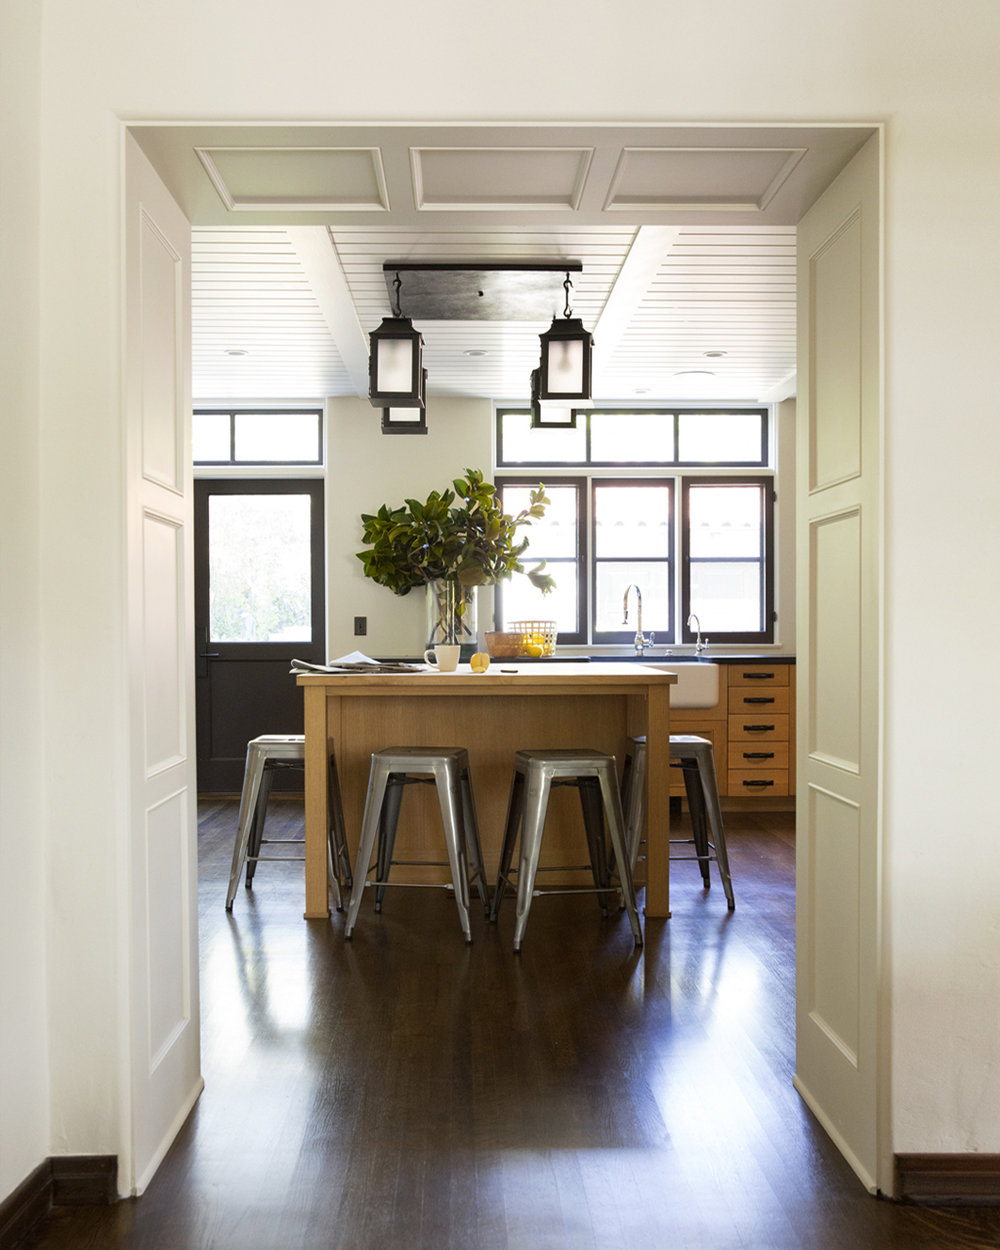 TMWEB_Goodman_hall_kitchen.jpg